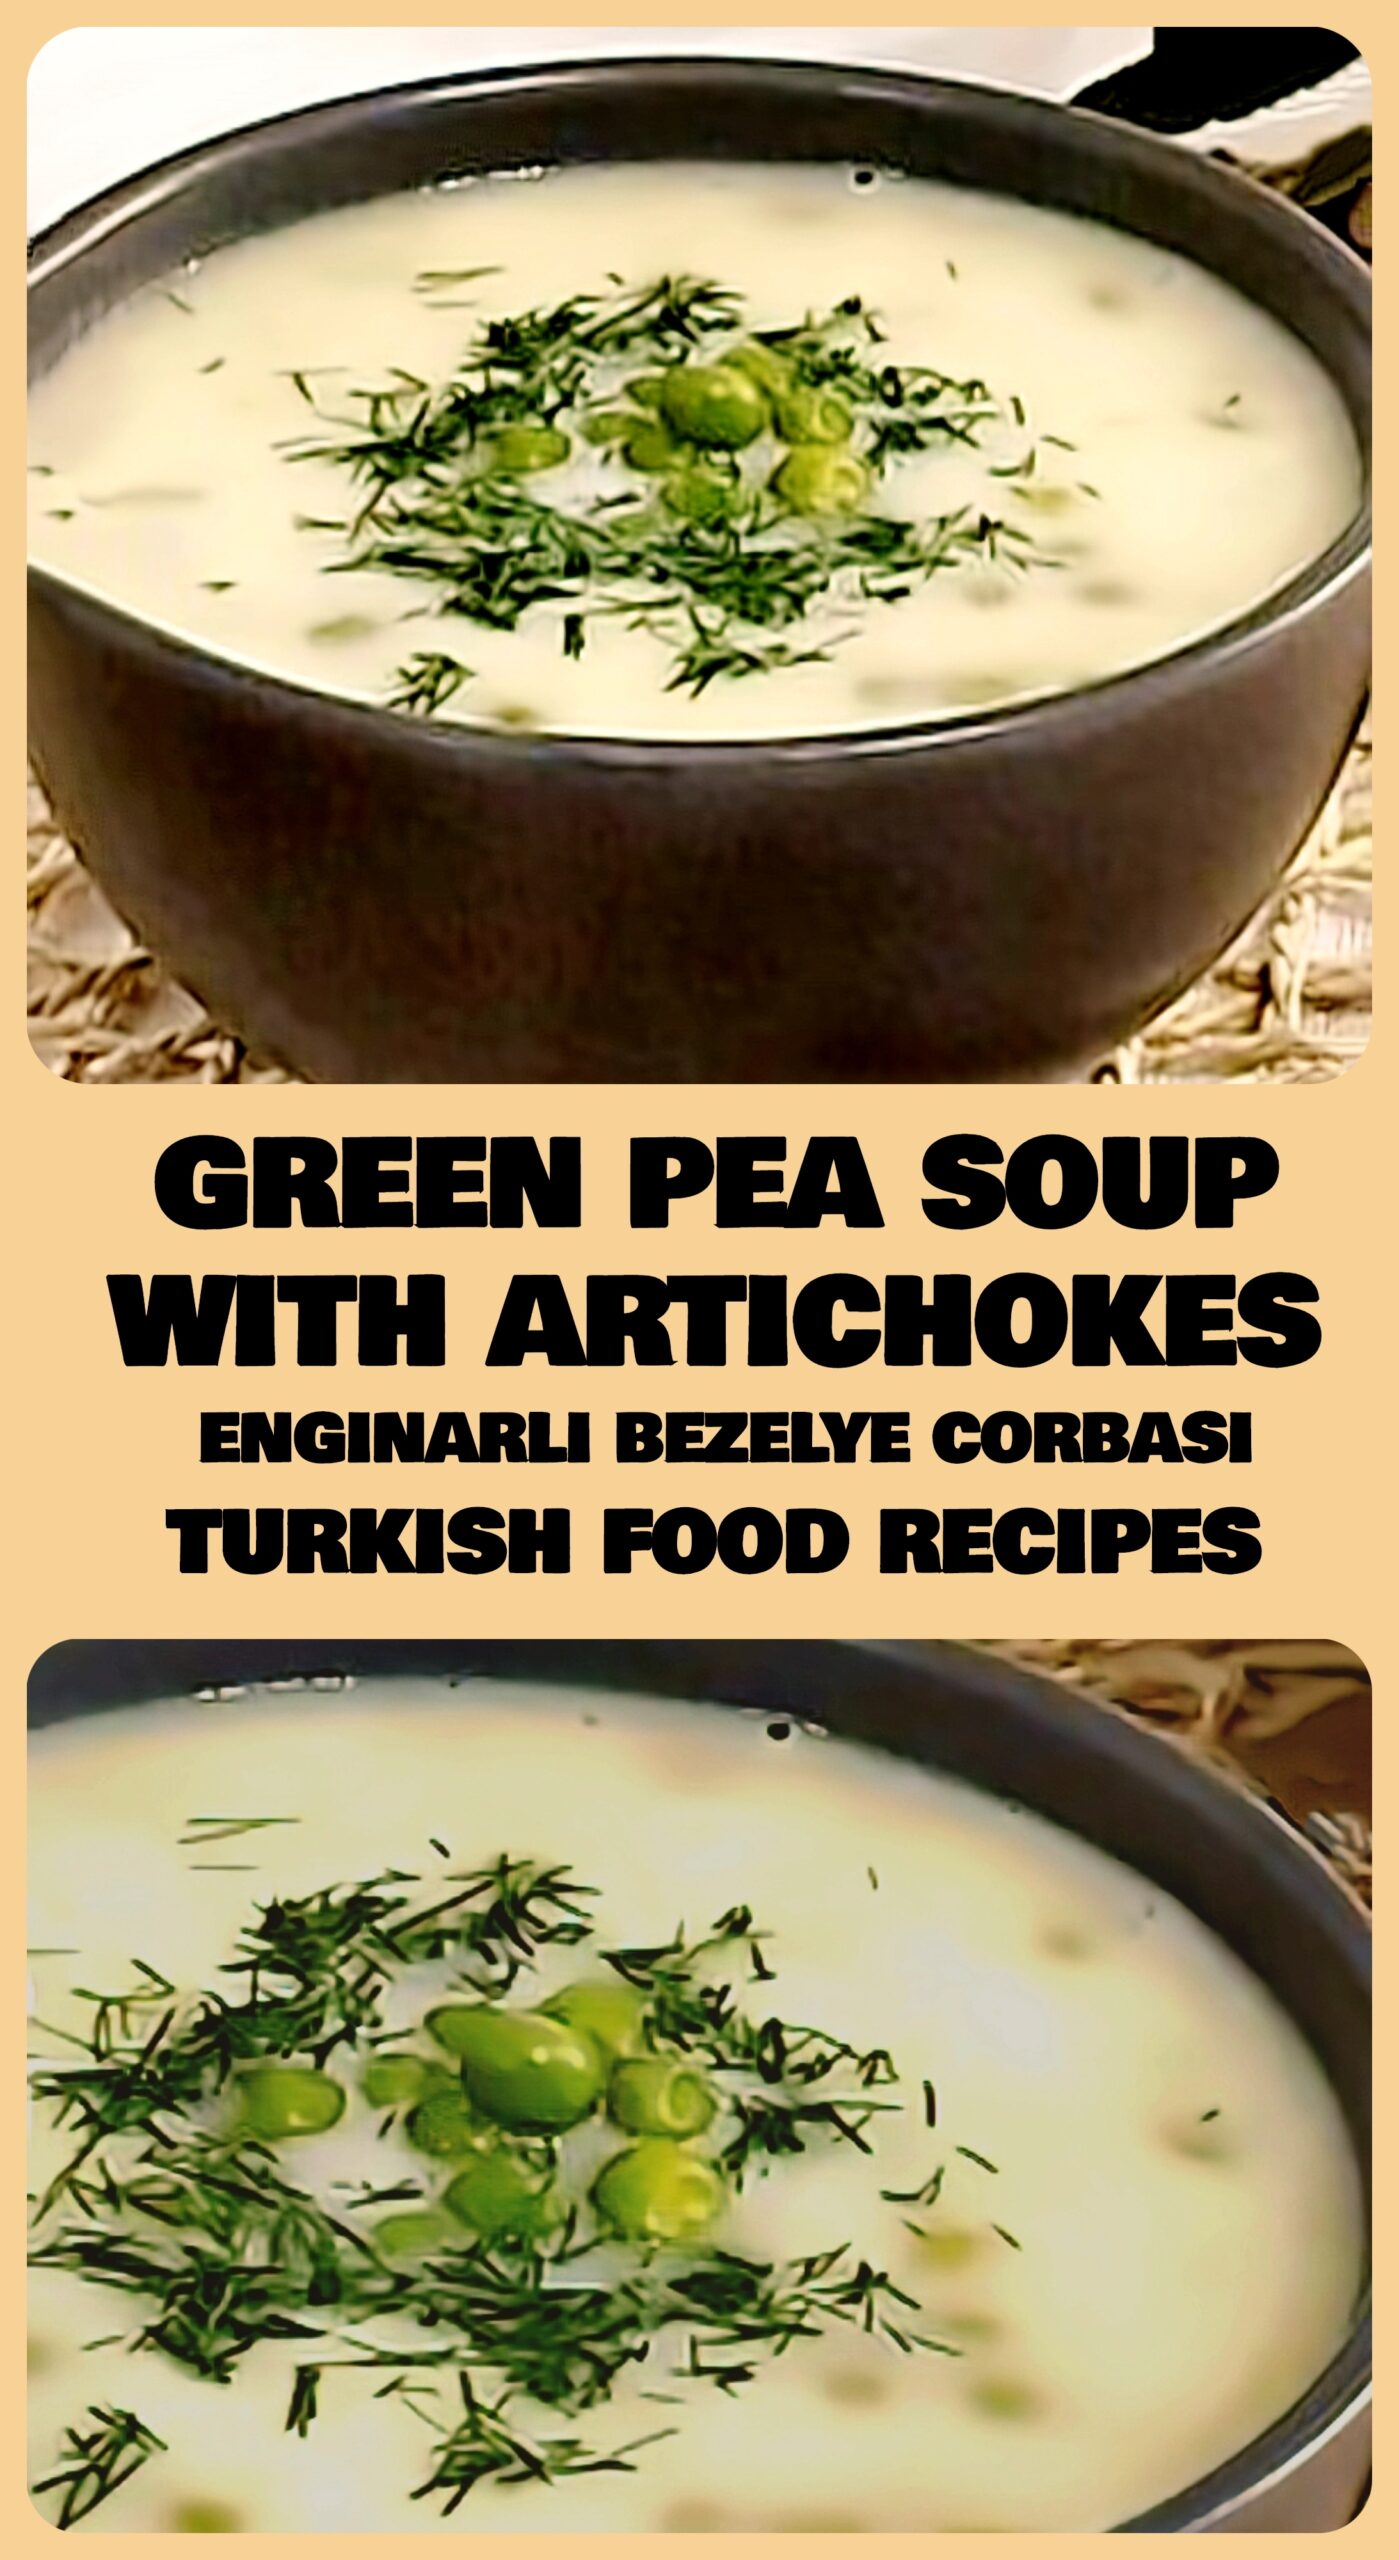 Green-Pea-Soup-With-Artichokes-Enginarli-Bezelye-Corbasi-Recipe